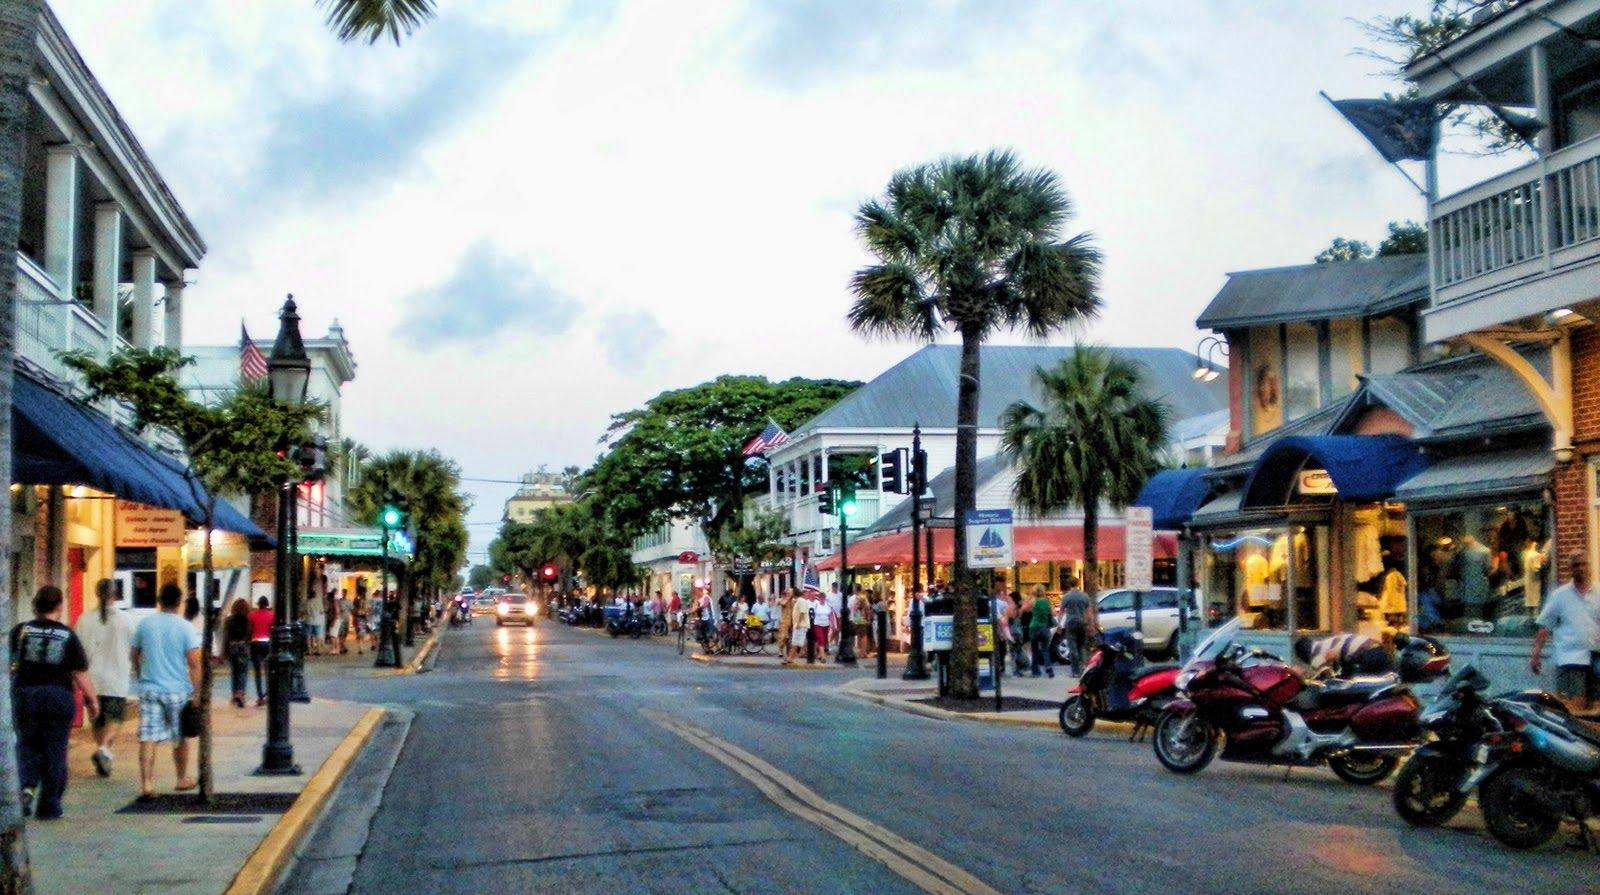 6. Florida